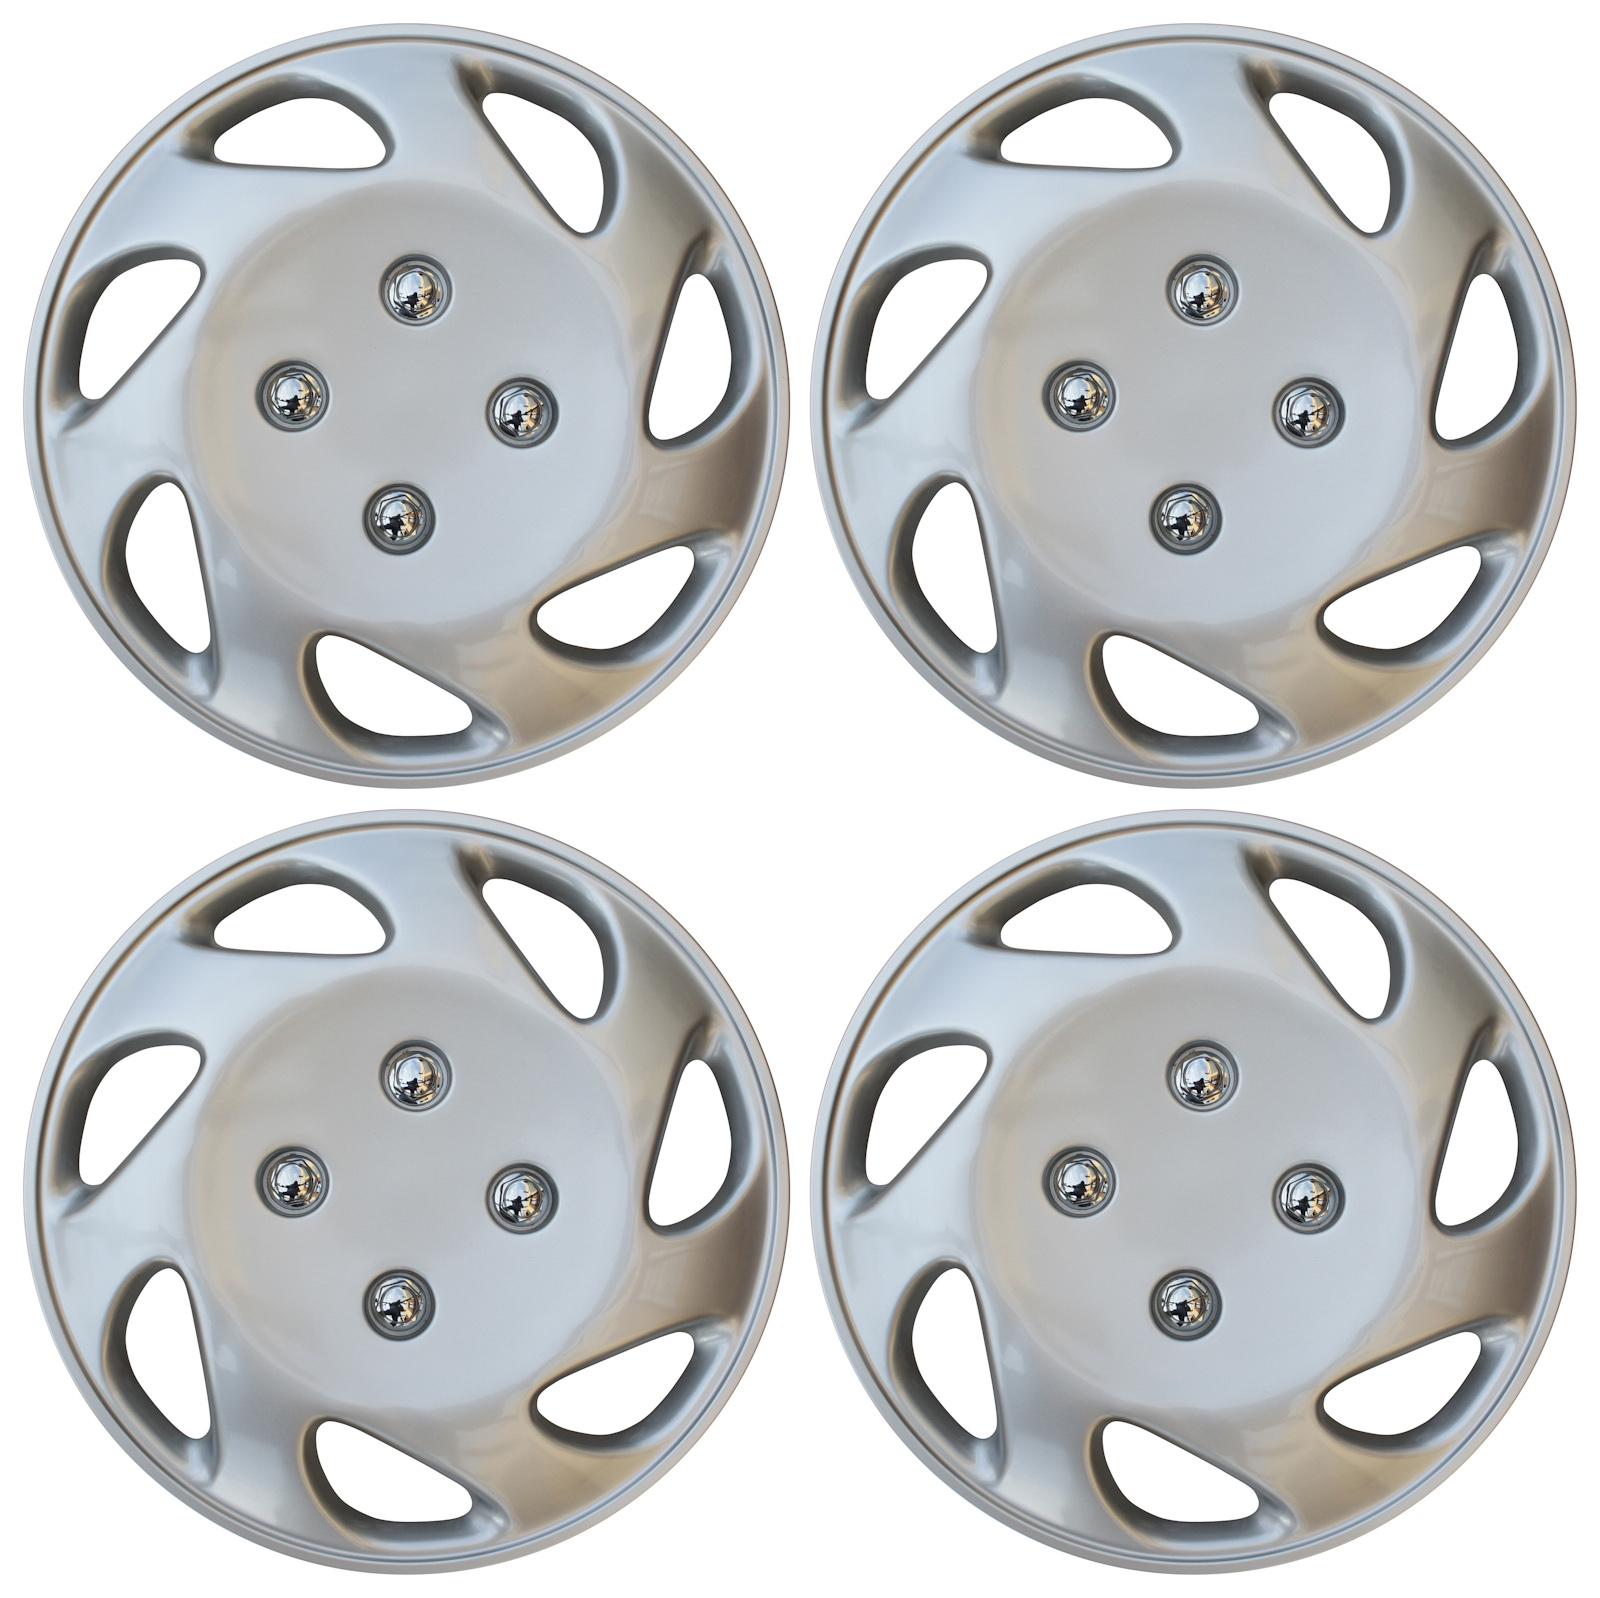 14 Honda Hubcaps >> 4 Pc Universal Hub Cap Abs Silver 14 Inch Rim Wheel Cover Caps Fits